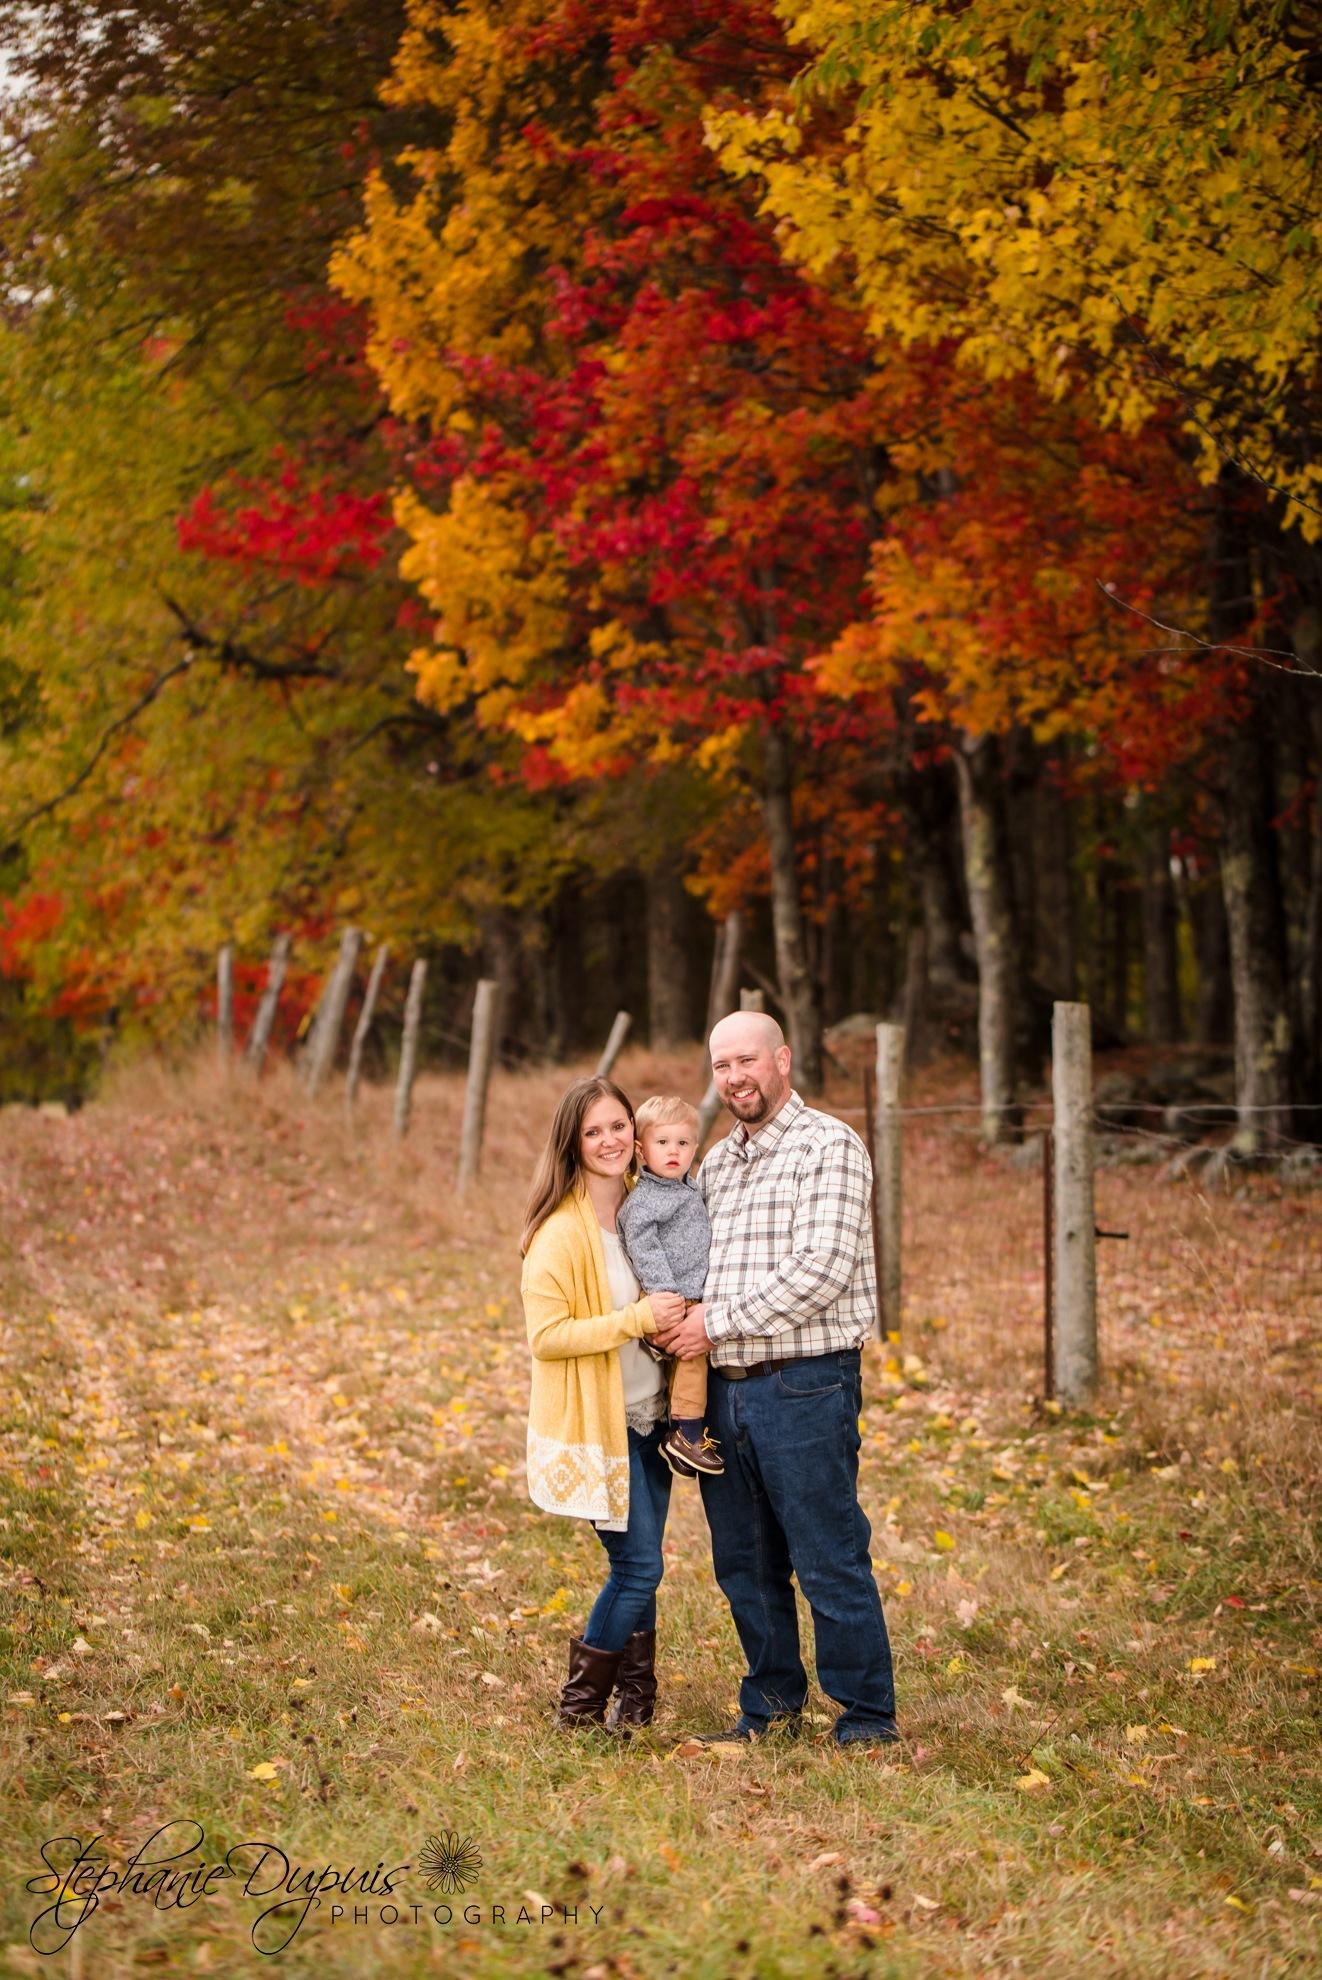 Cormier Family 10 - Portfolio: Cormier Family Session